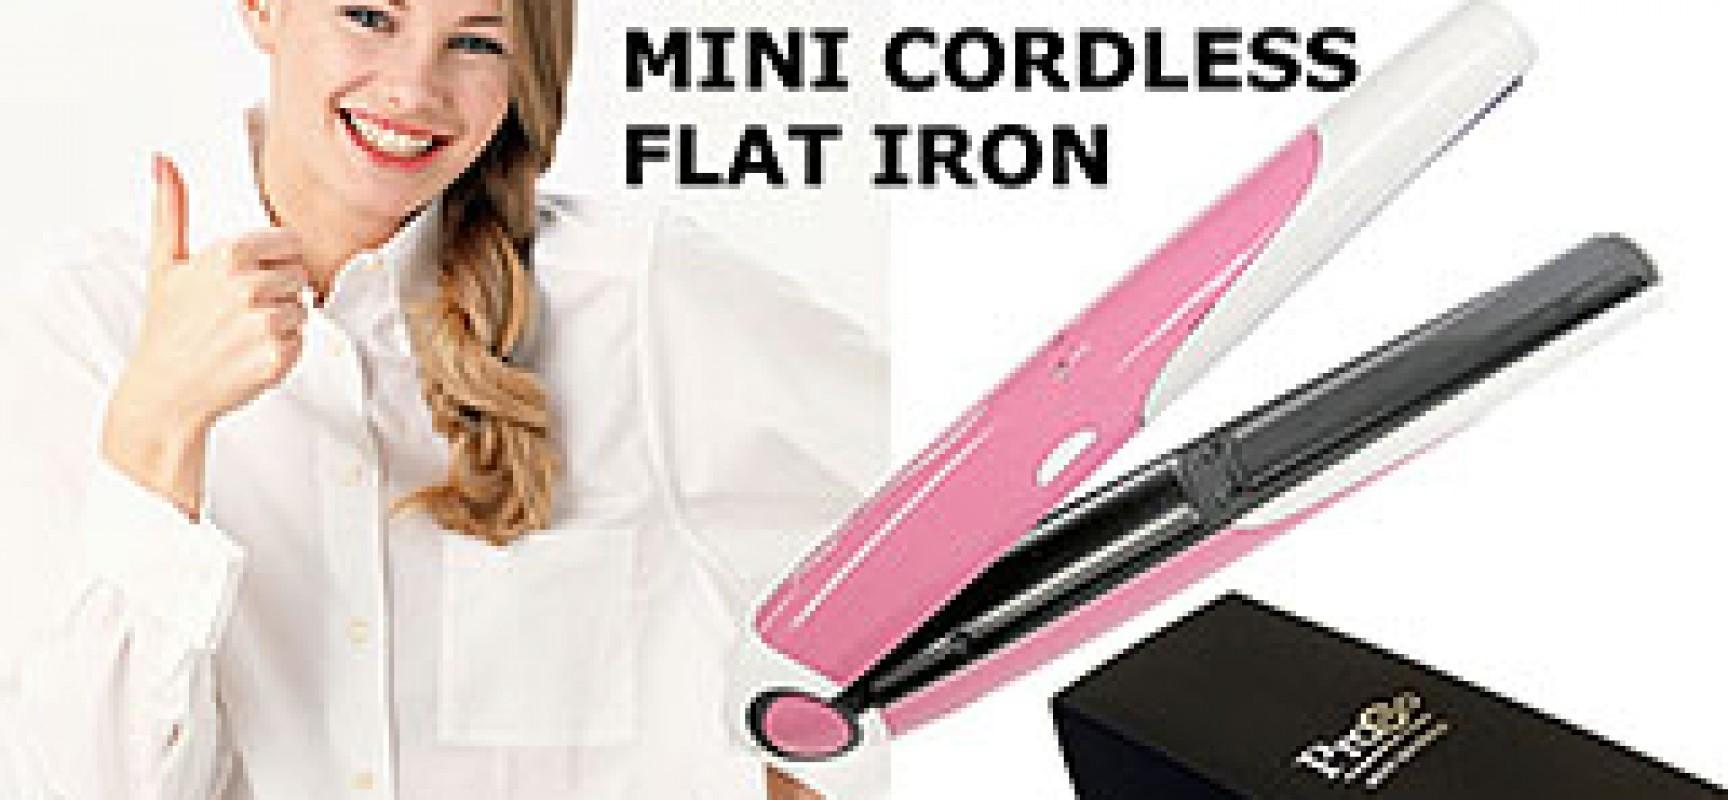 Best cordless flat irons